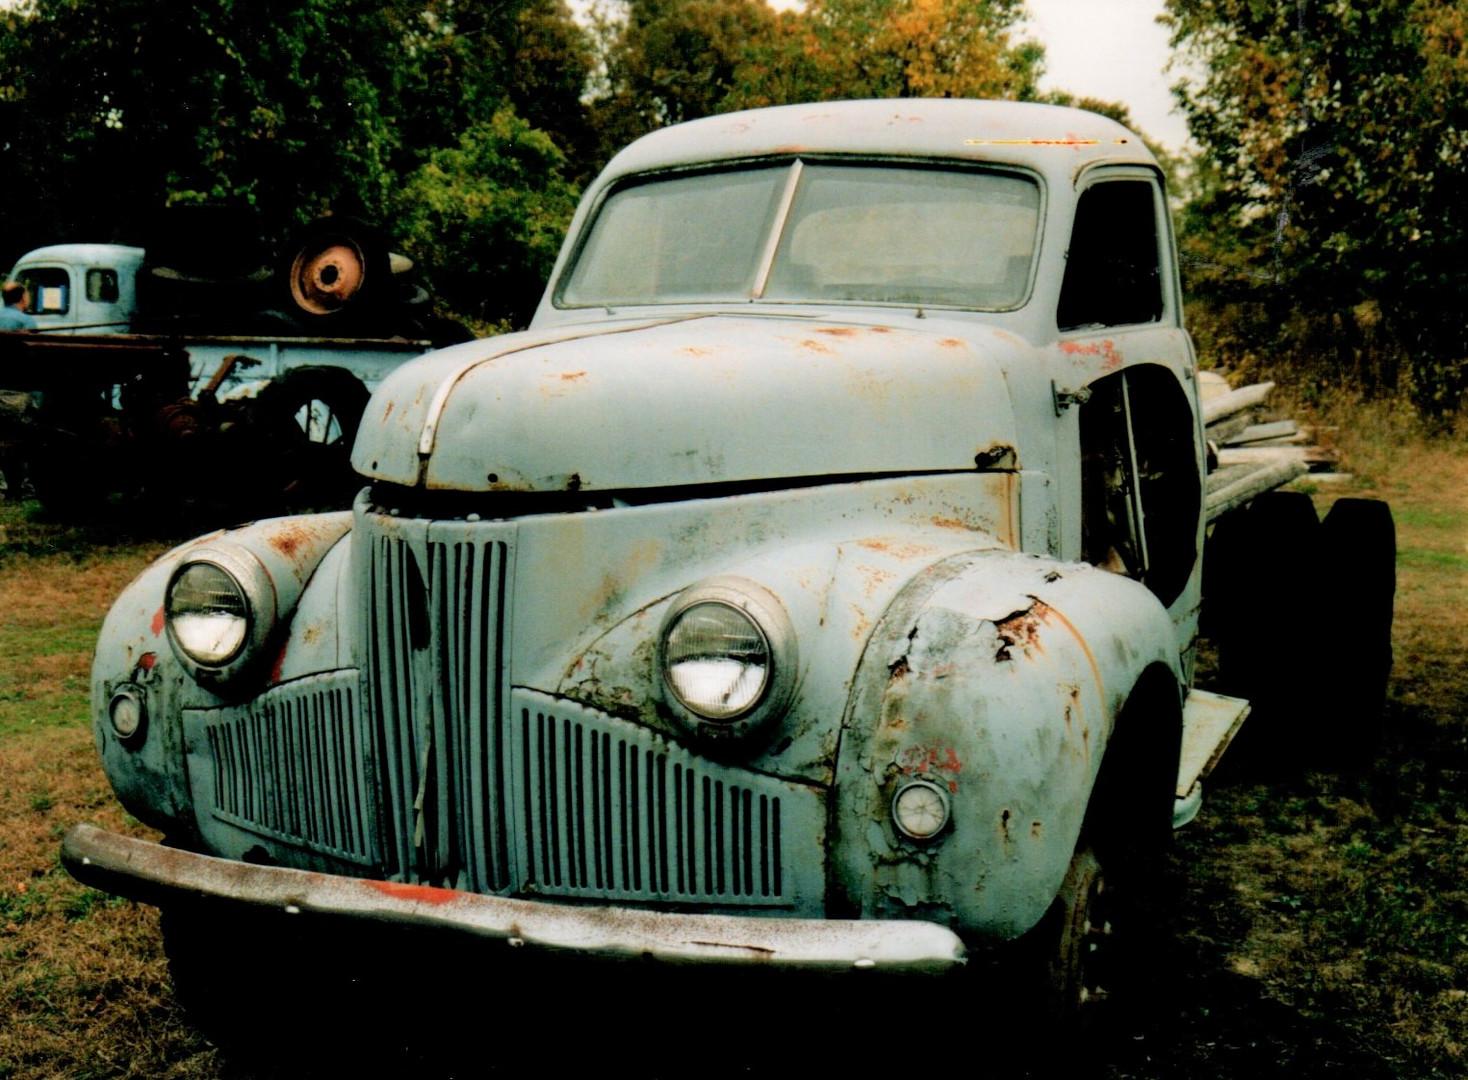 1947 Studebaker - Ron Bush